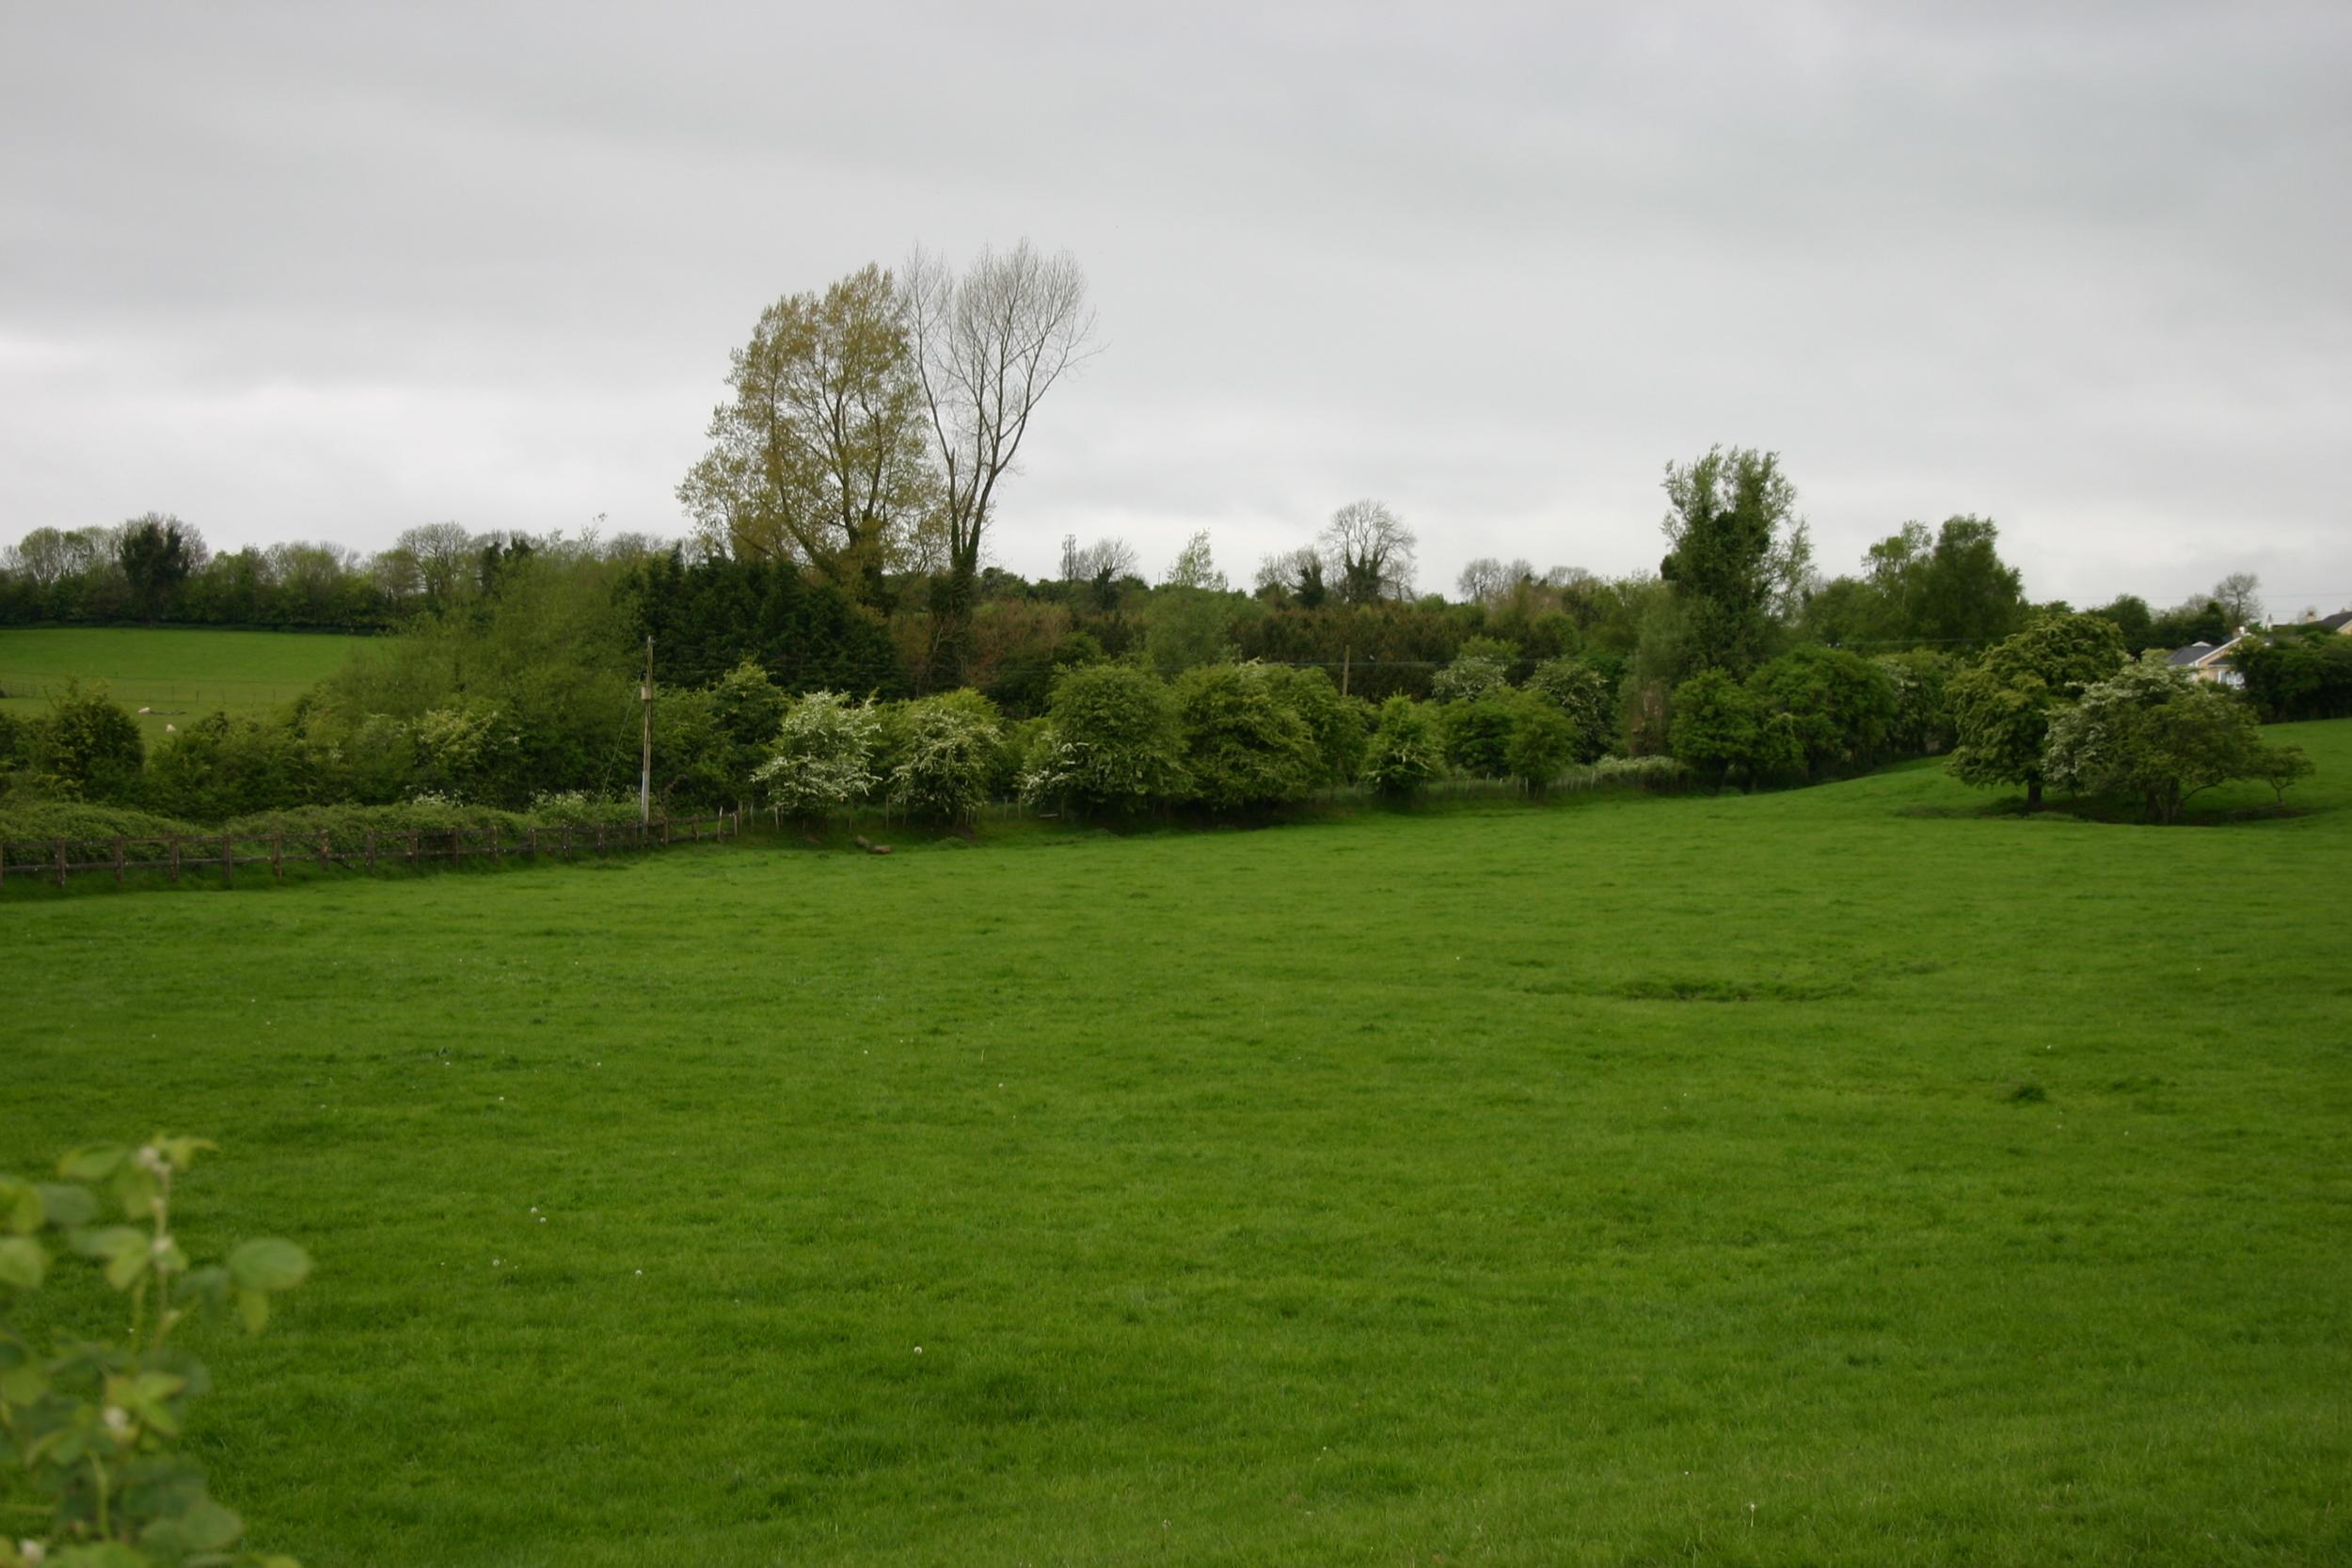 kildare green.jpg